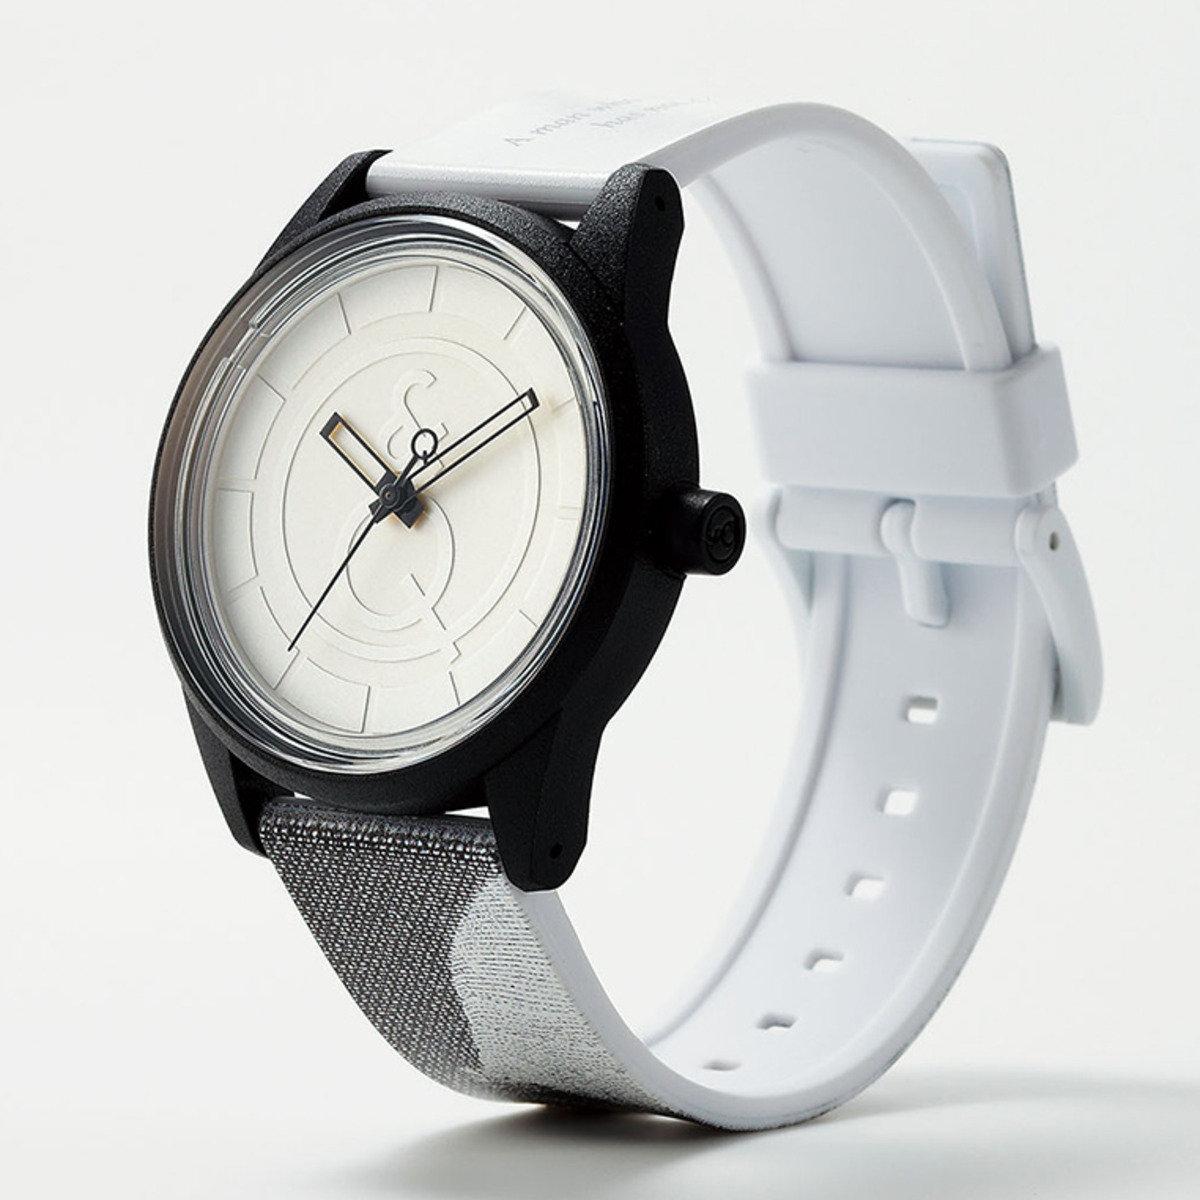 GREAT MAN 手錶 - 達爾文